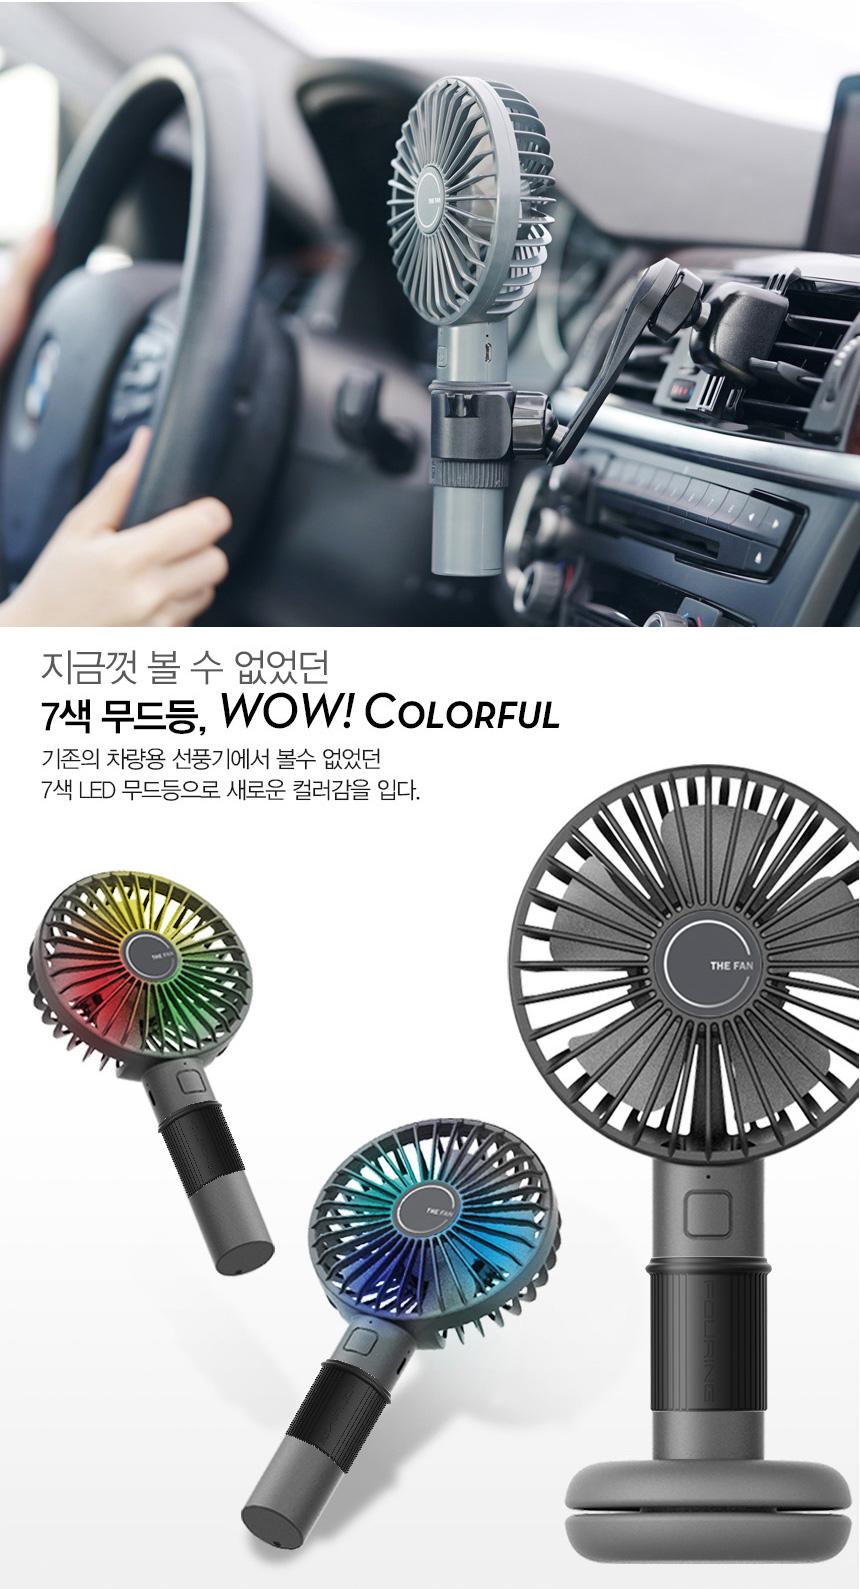 THE FAN plus 차량용선풍기 CD슬롯형 손풍기 - 훠링, 35,000원, 자동차용품, 기타용품